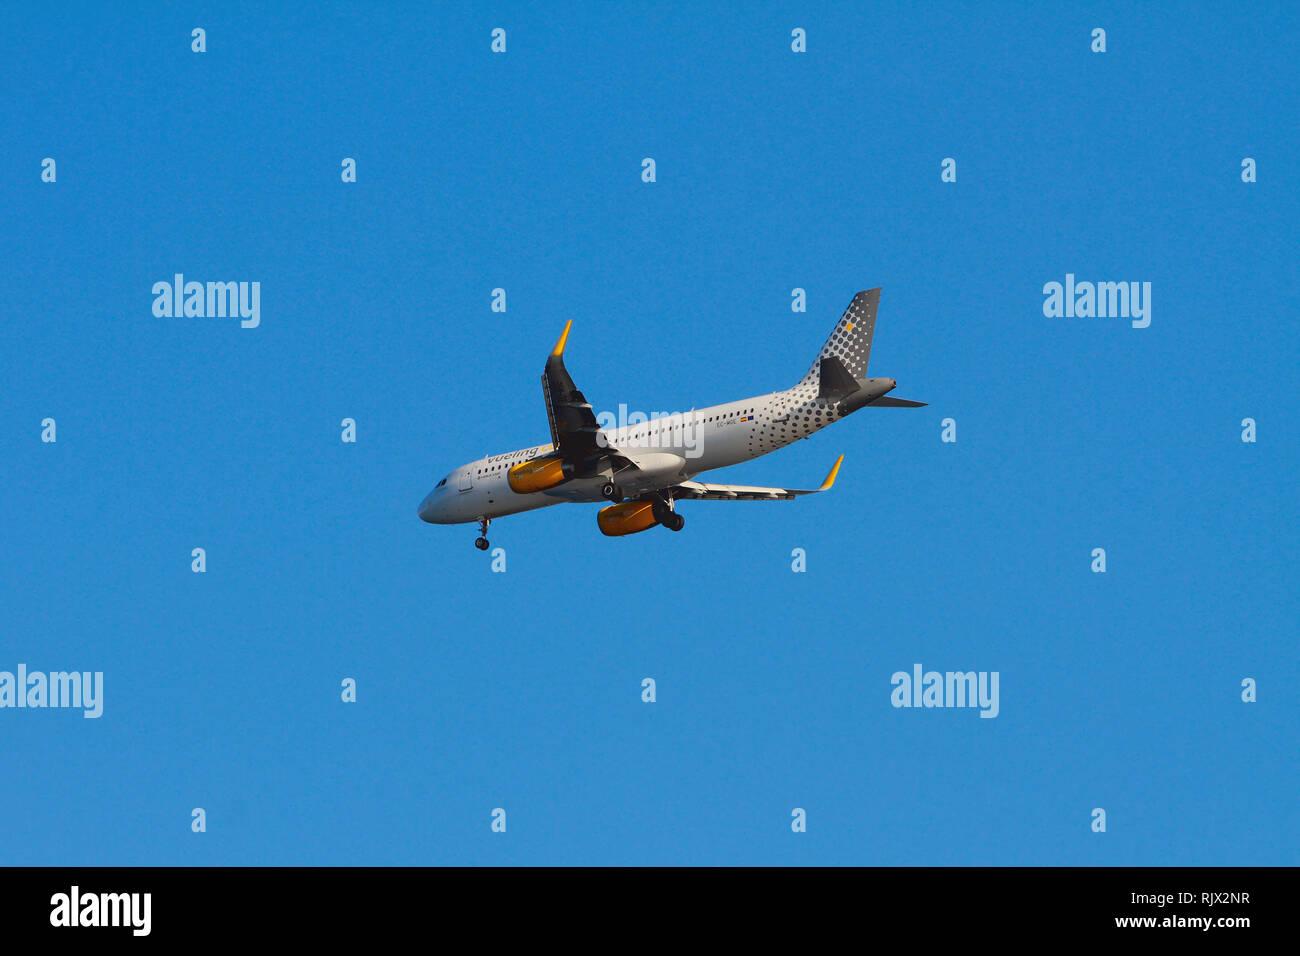 Palma-de-Mallorca, Spain - Oct 02, 2018: Plane of Vueling Airlines company when landing - Stock Image